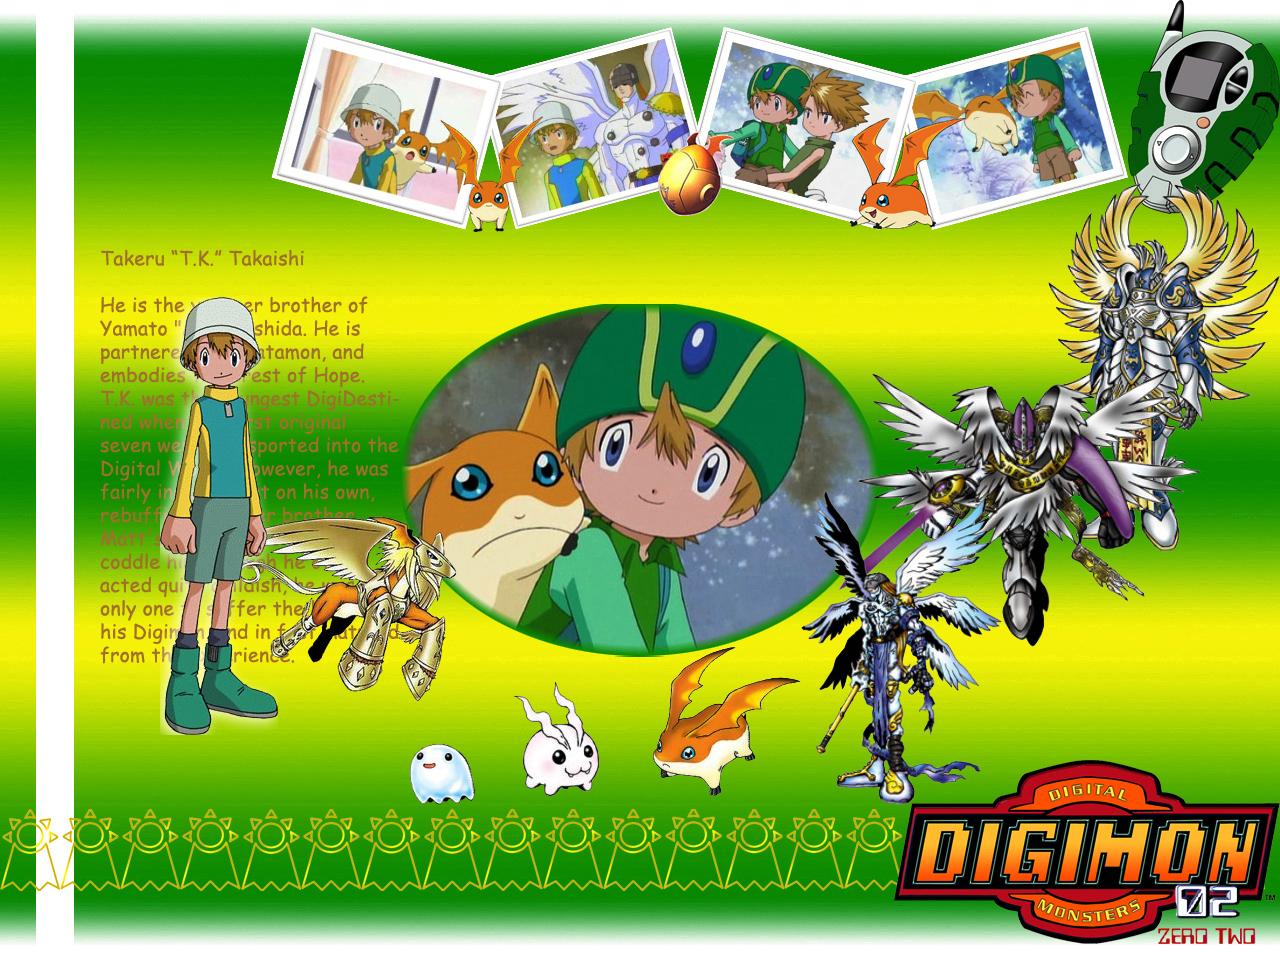 Digimon Adventure Wallpaper 1193522 Zerochan Anime Image